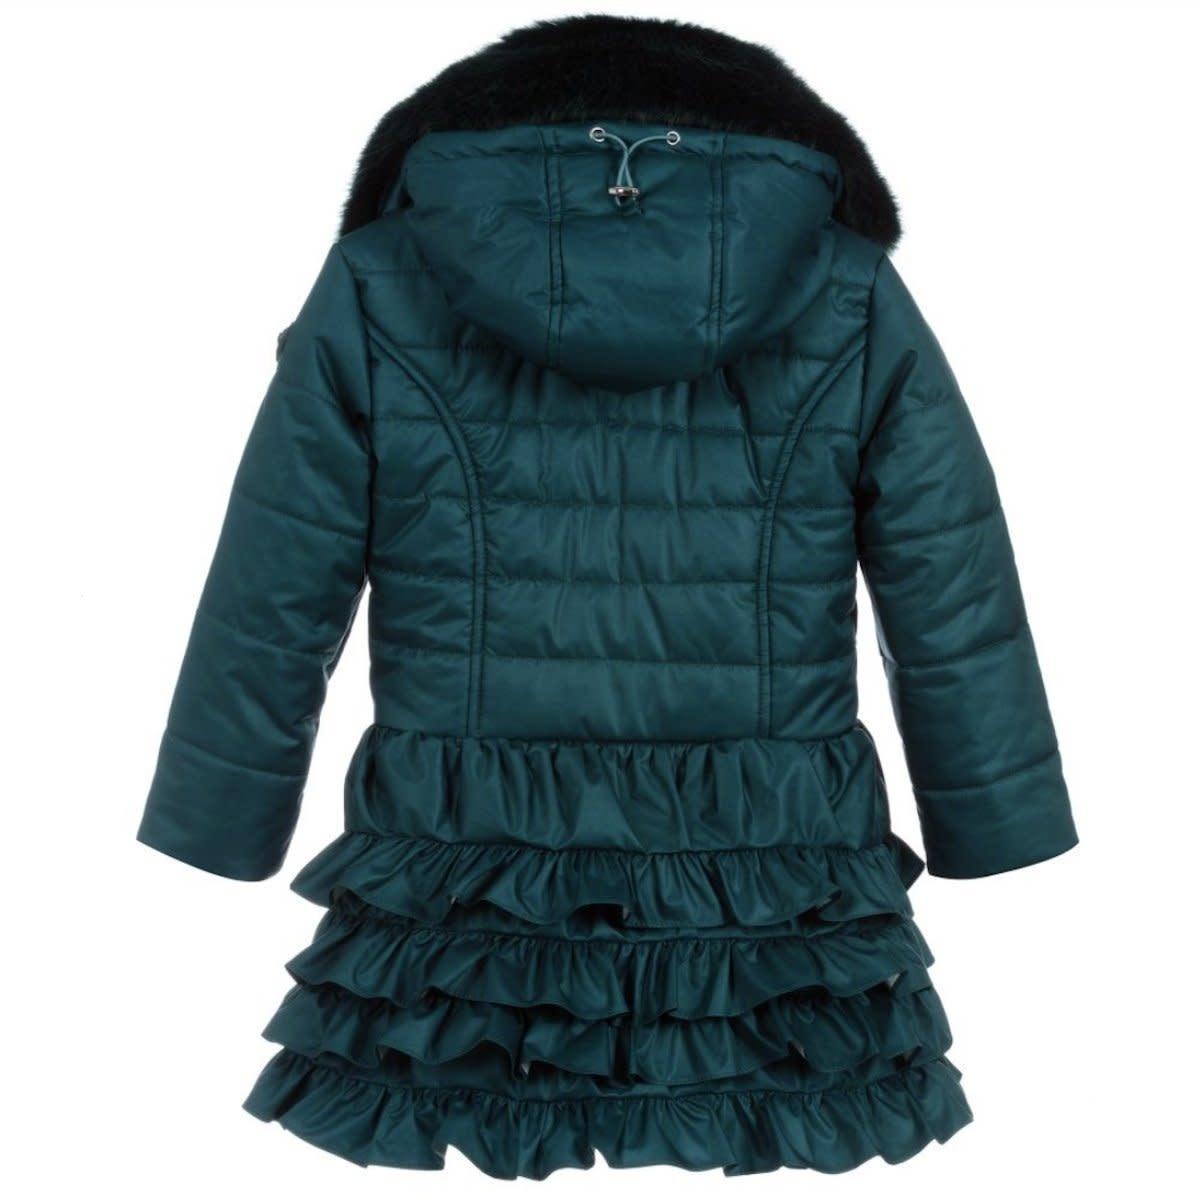 Lechic LeChic C007-5207 Teal Luxury Winter Ruffle Coat